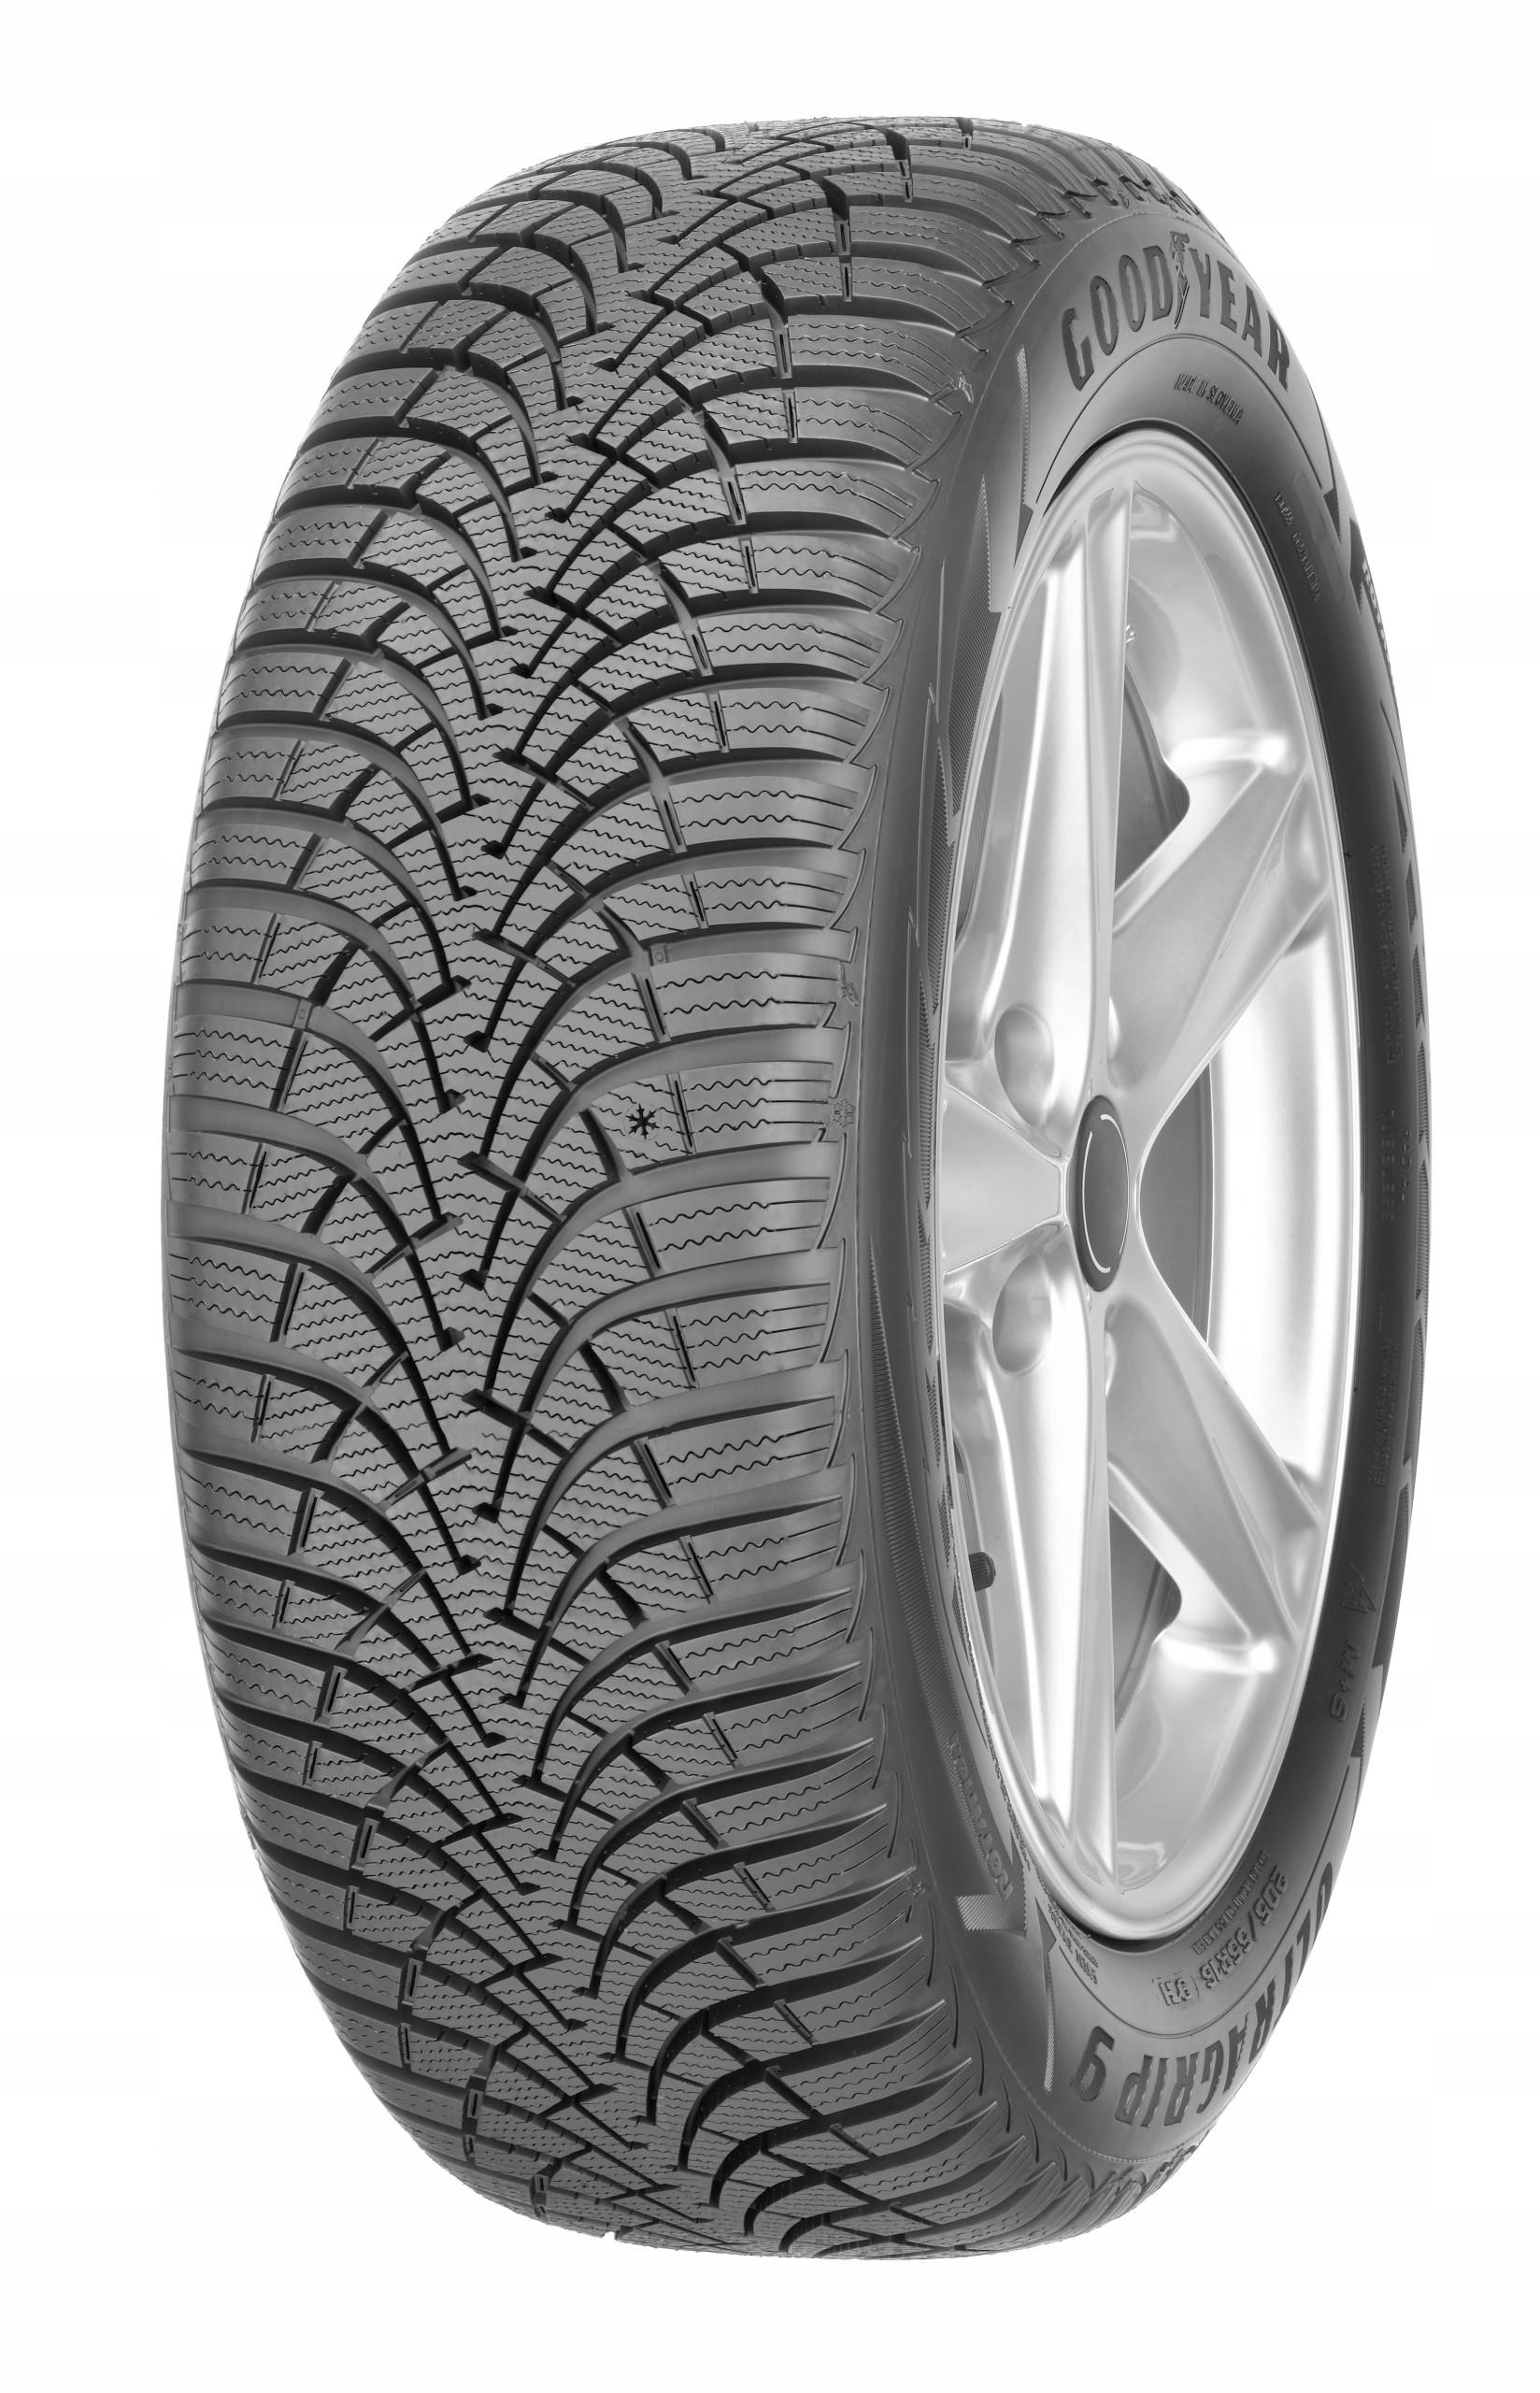 Neumático GOODYEAR UG9 + 195/65R15 91 T